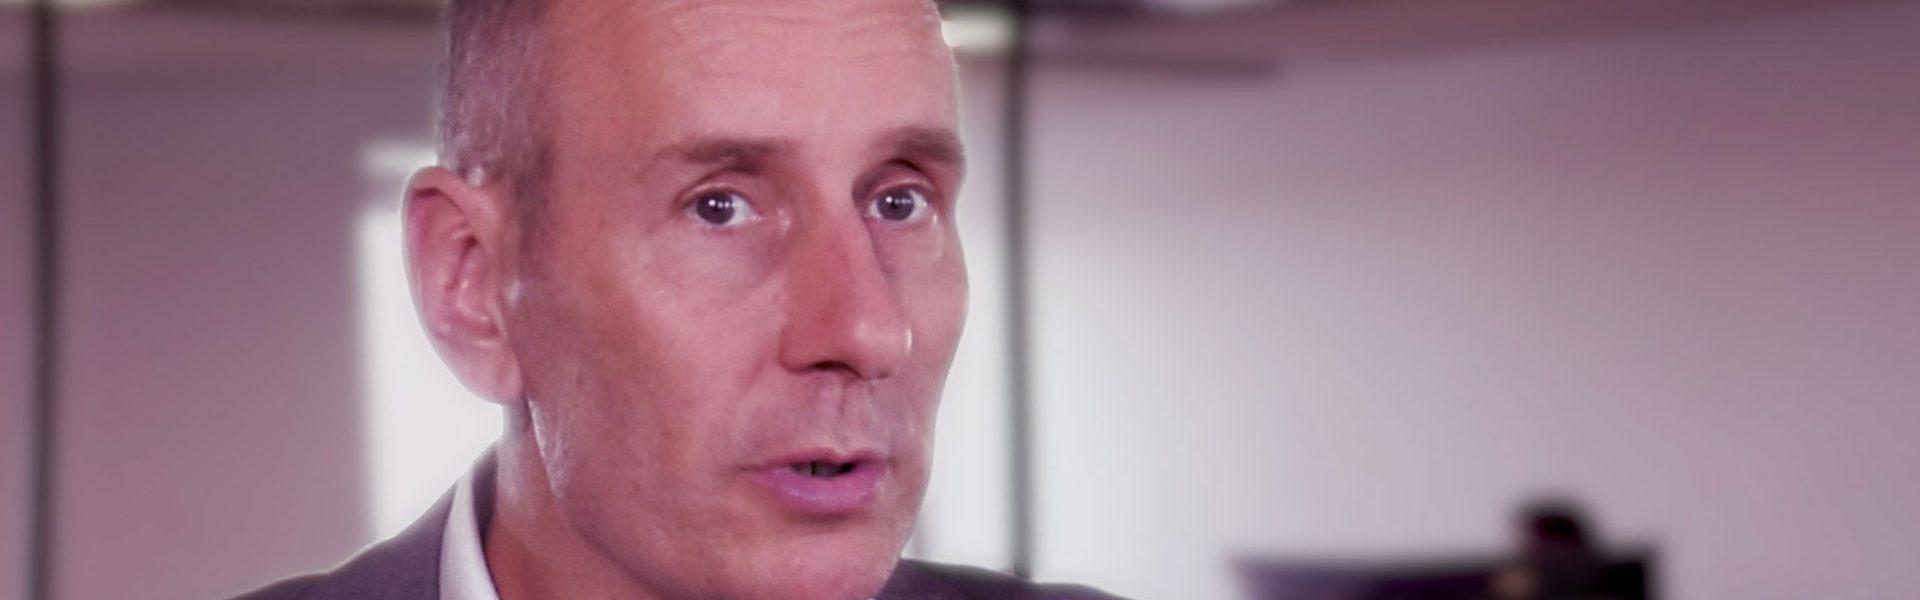 CEO Peter Altevogt van Korton Groep